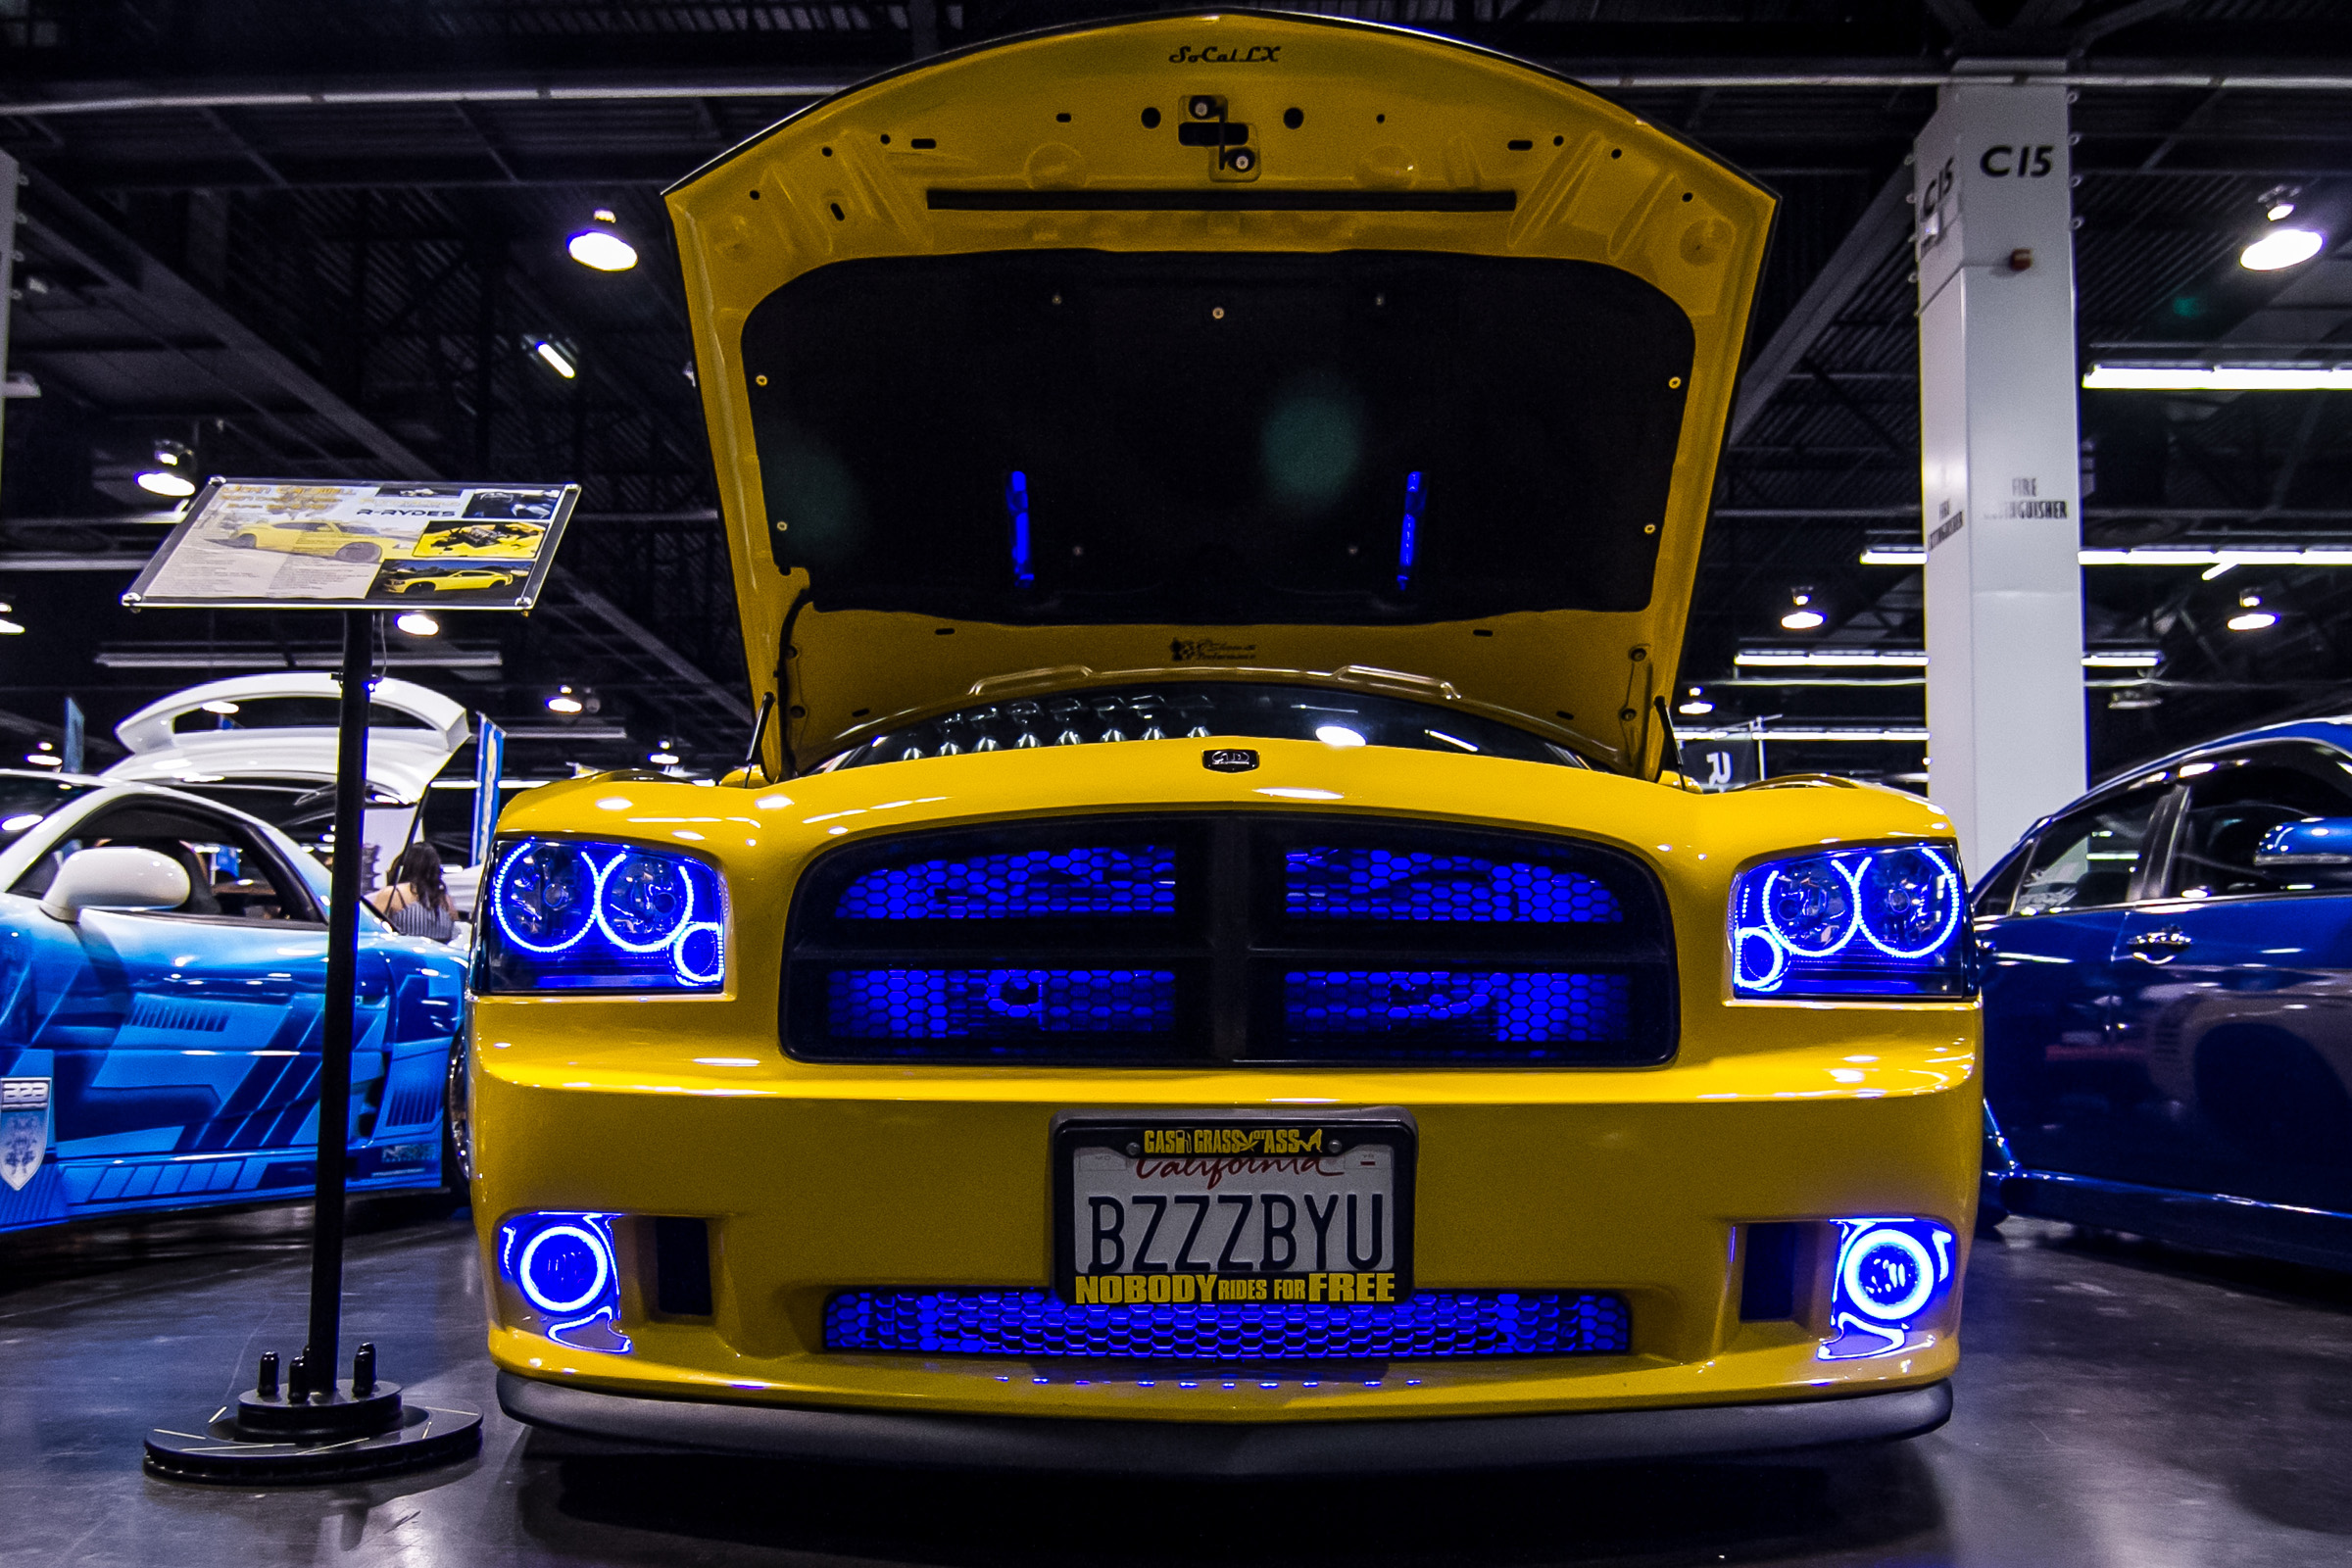 ludwig_ortiz_automotive_0078.jpg